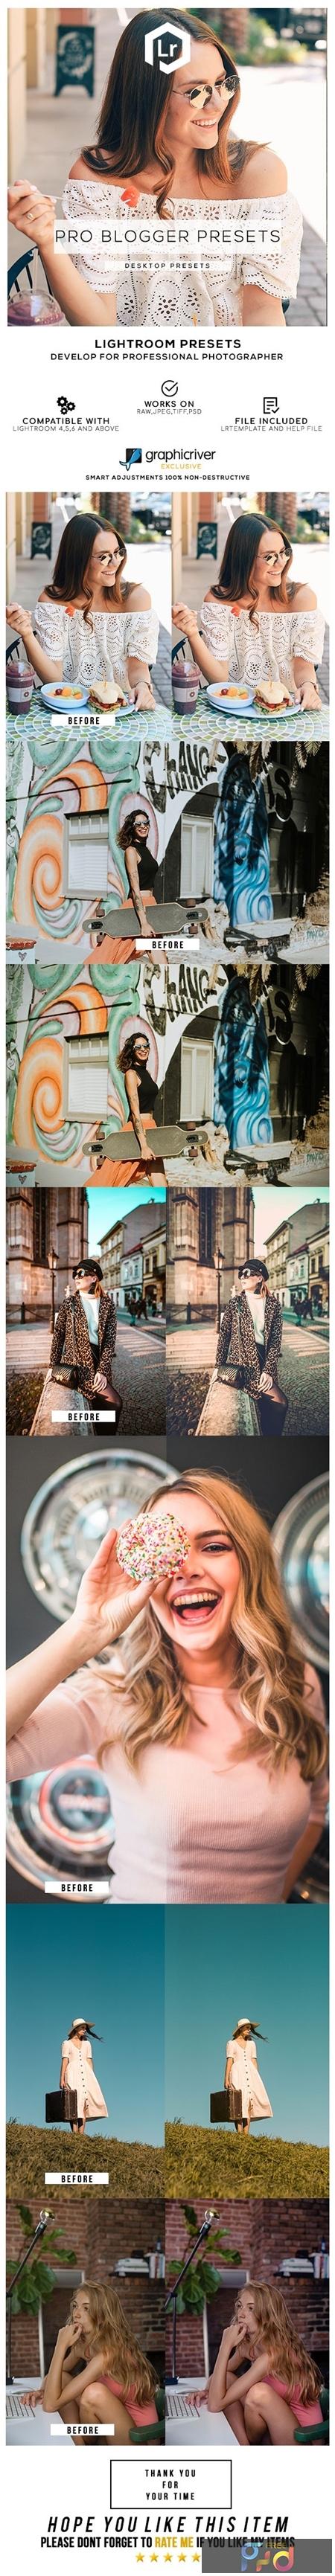 24 Pro Blogger Presets 25591496 1